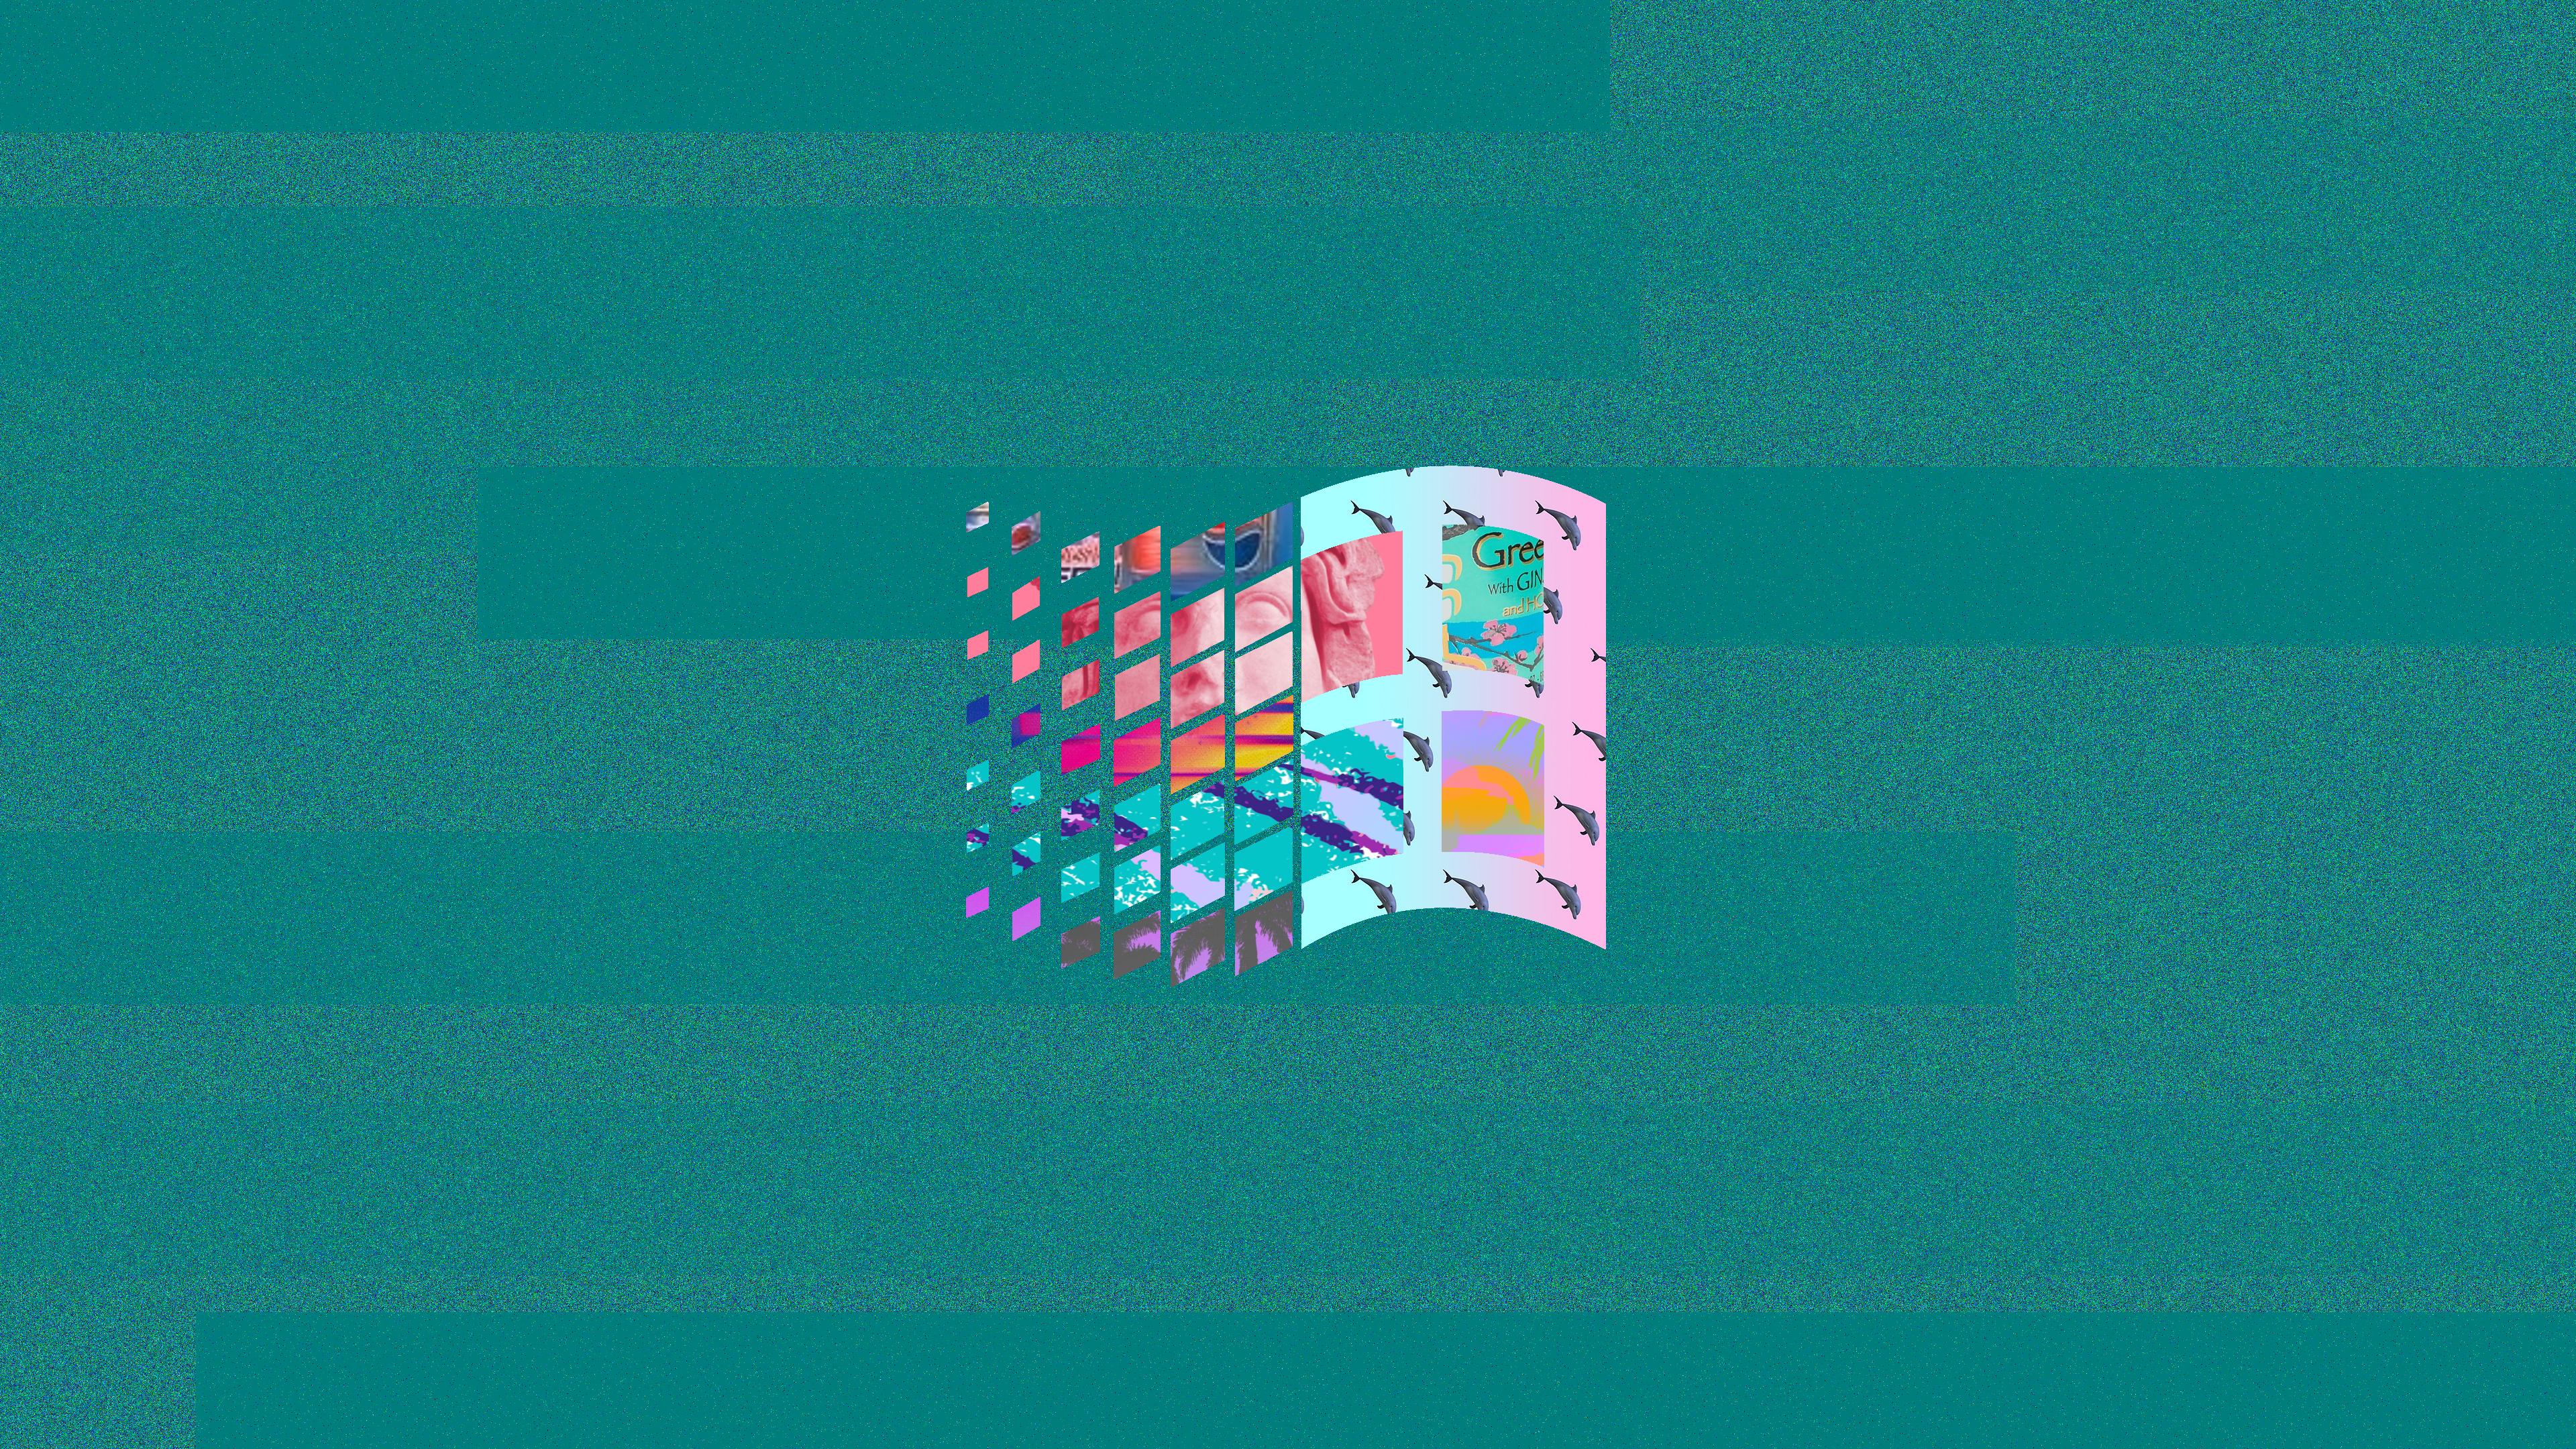 4k Pc Wallpaper Of Win 95 Oc Aesthetic Desktop Wallpaper Desktop Wallpaper Art Wallpaper